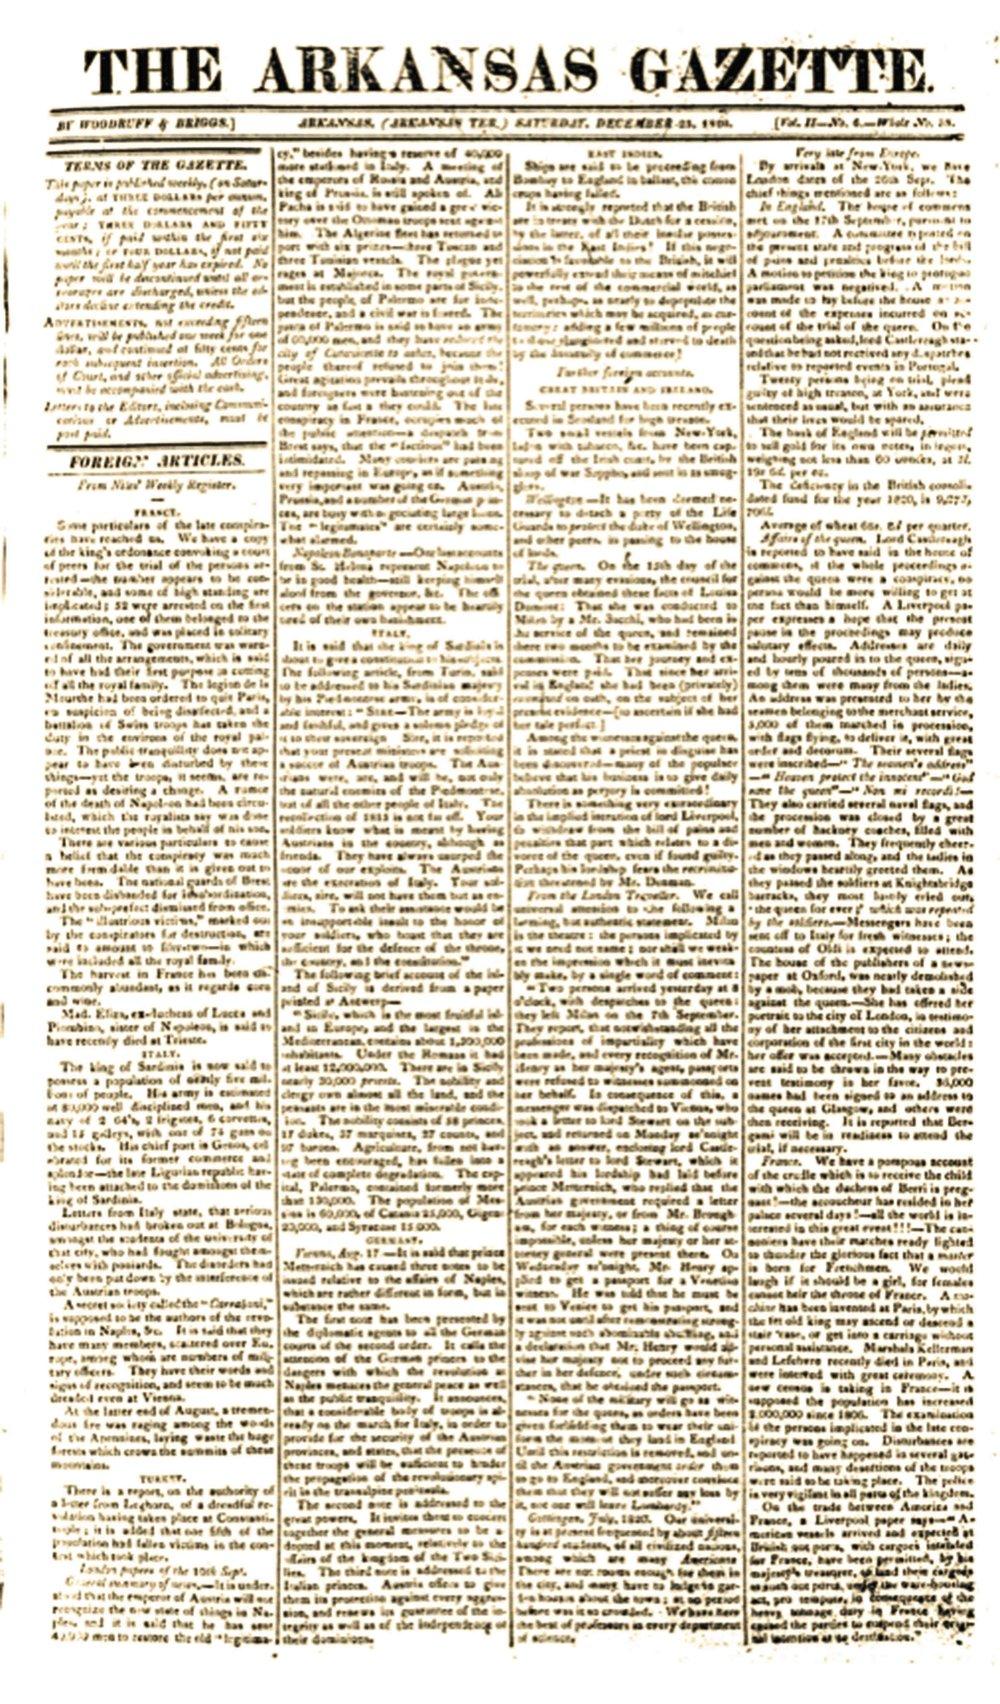 Page one of William Woodruff's Dec. 23, 1820, four-page Arkansas Gazette. (Arkansas Democrat-Gazette)